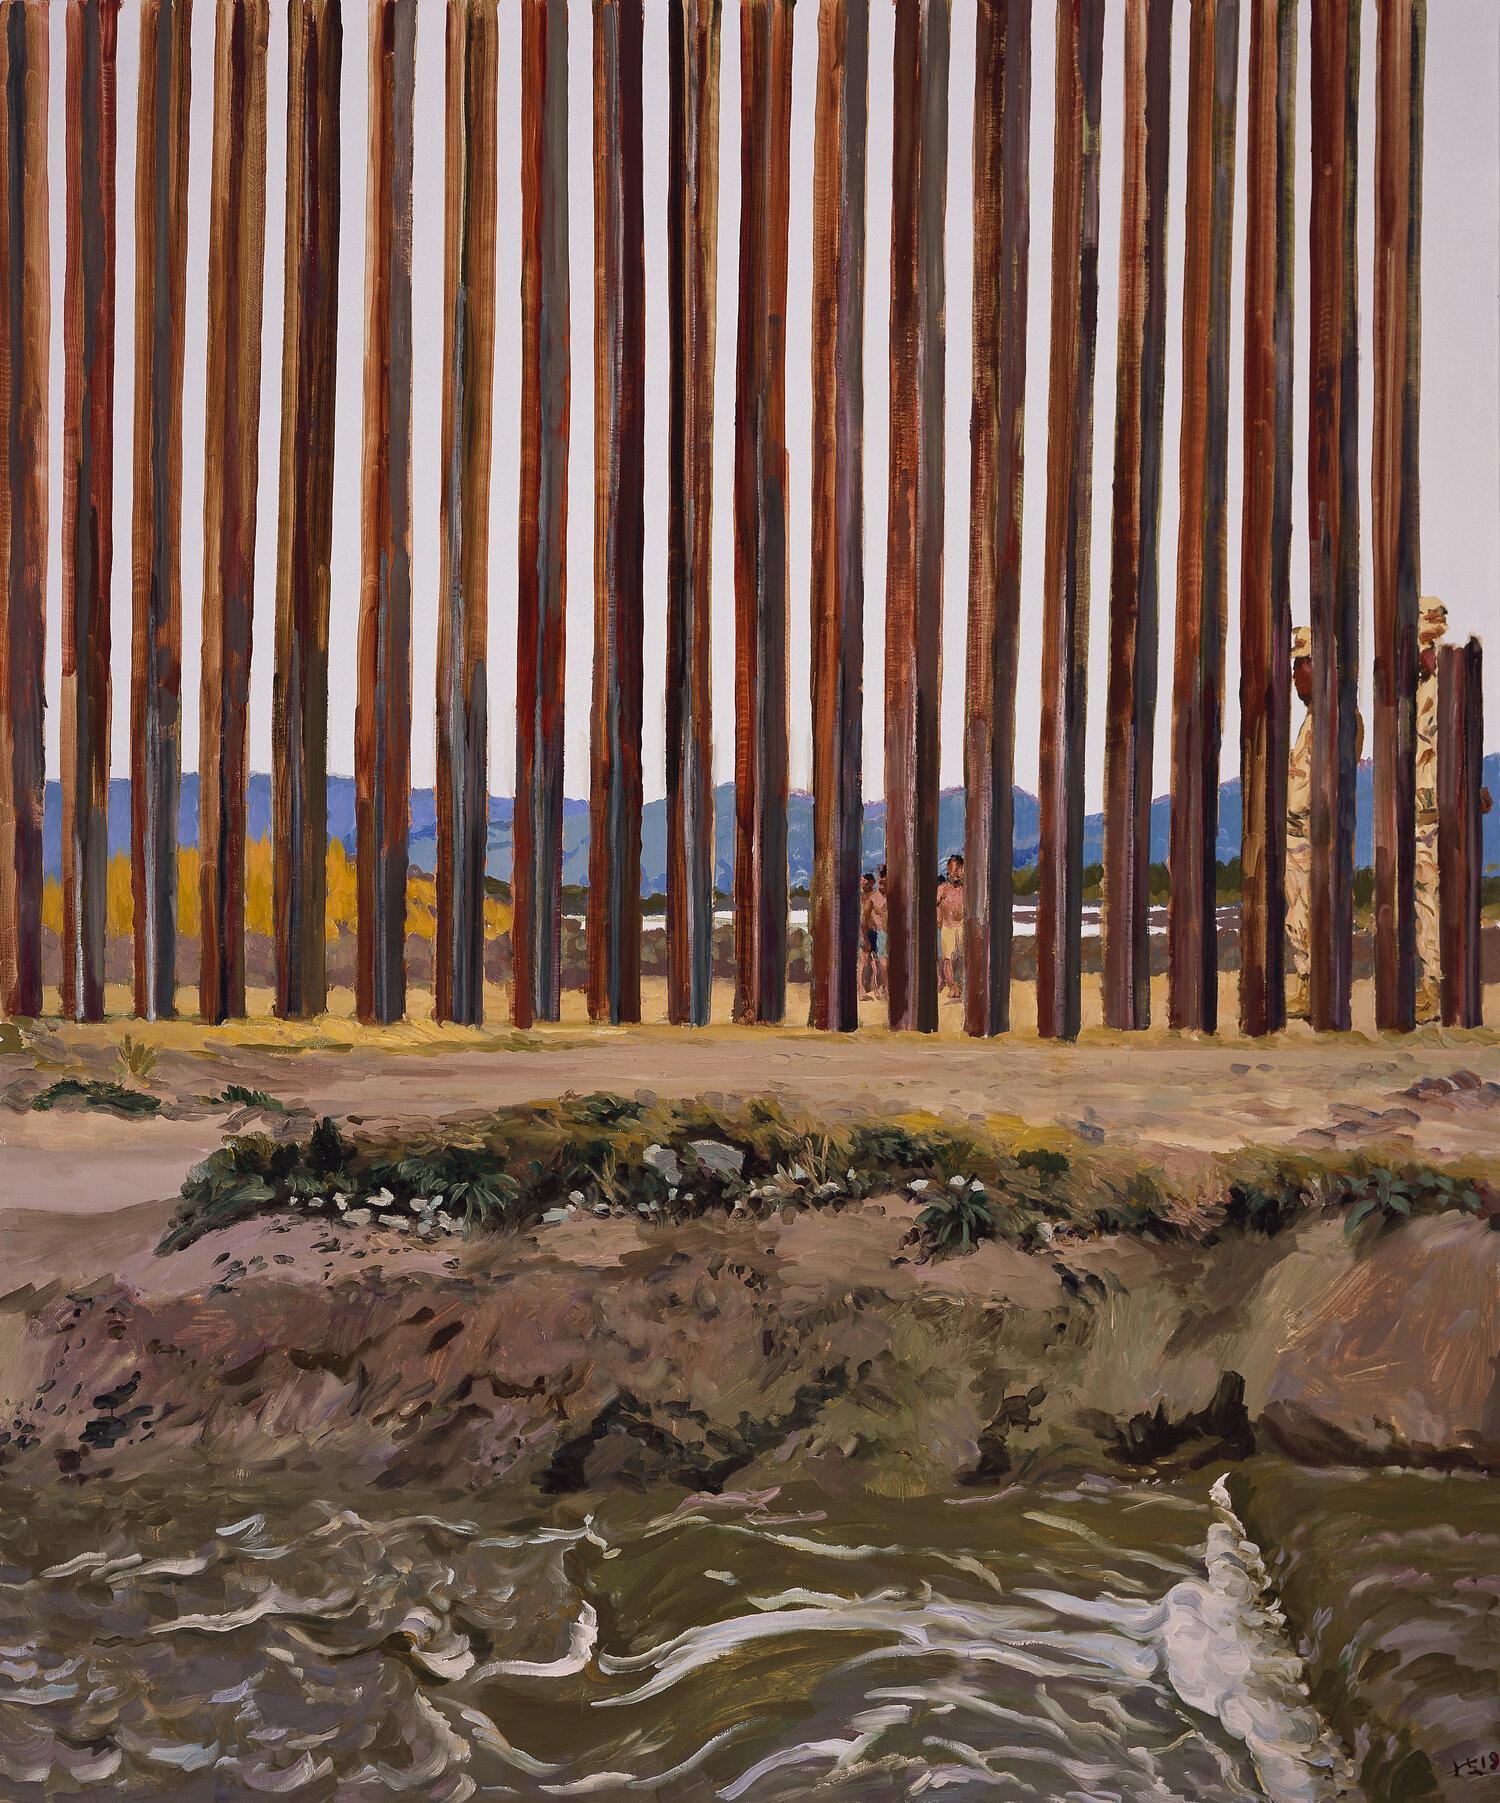 Chinese artist Liu Xiaodong at Dallas Contemporary Usa